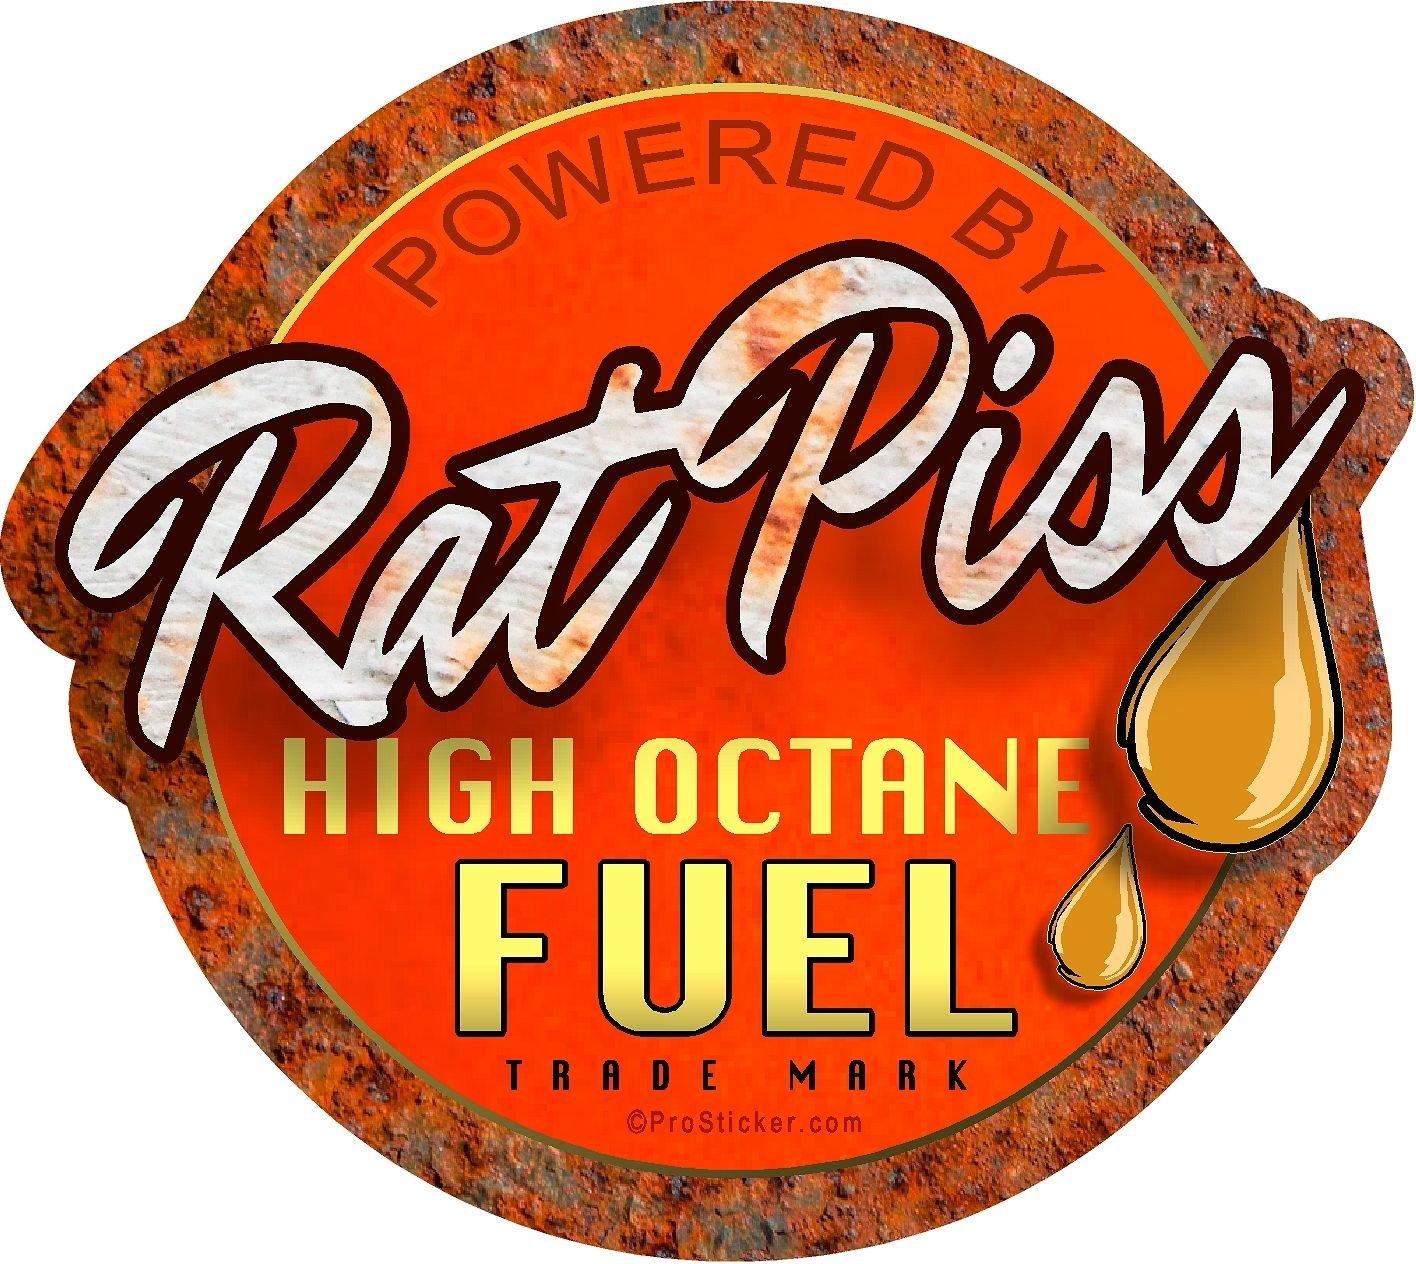 Two 4 X 4.5 Rat Rod Series Rat Piss High Octane Fuel Decal Sticker ProSticker 756.2PK